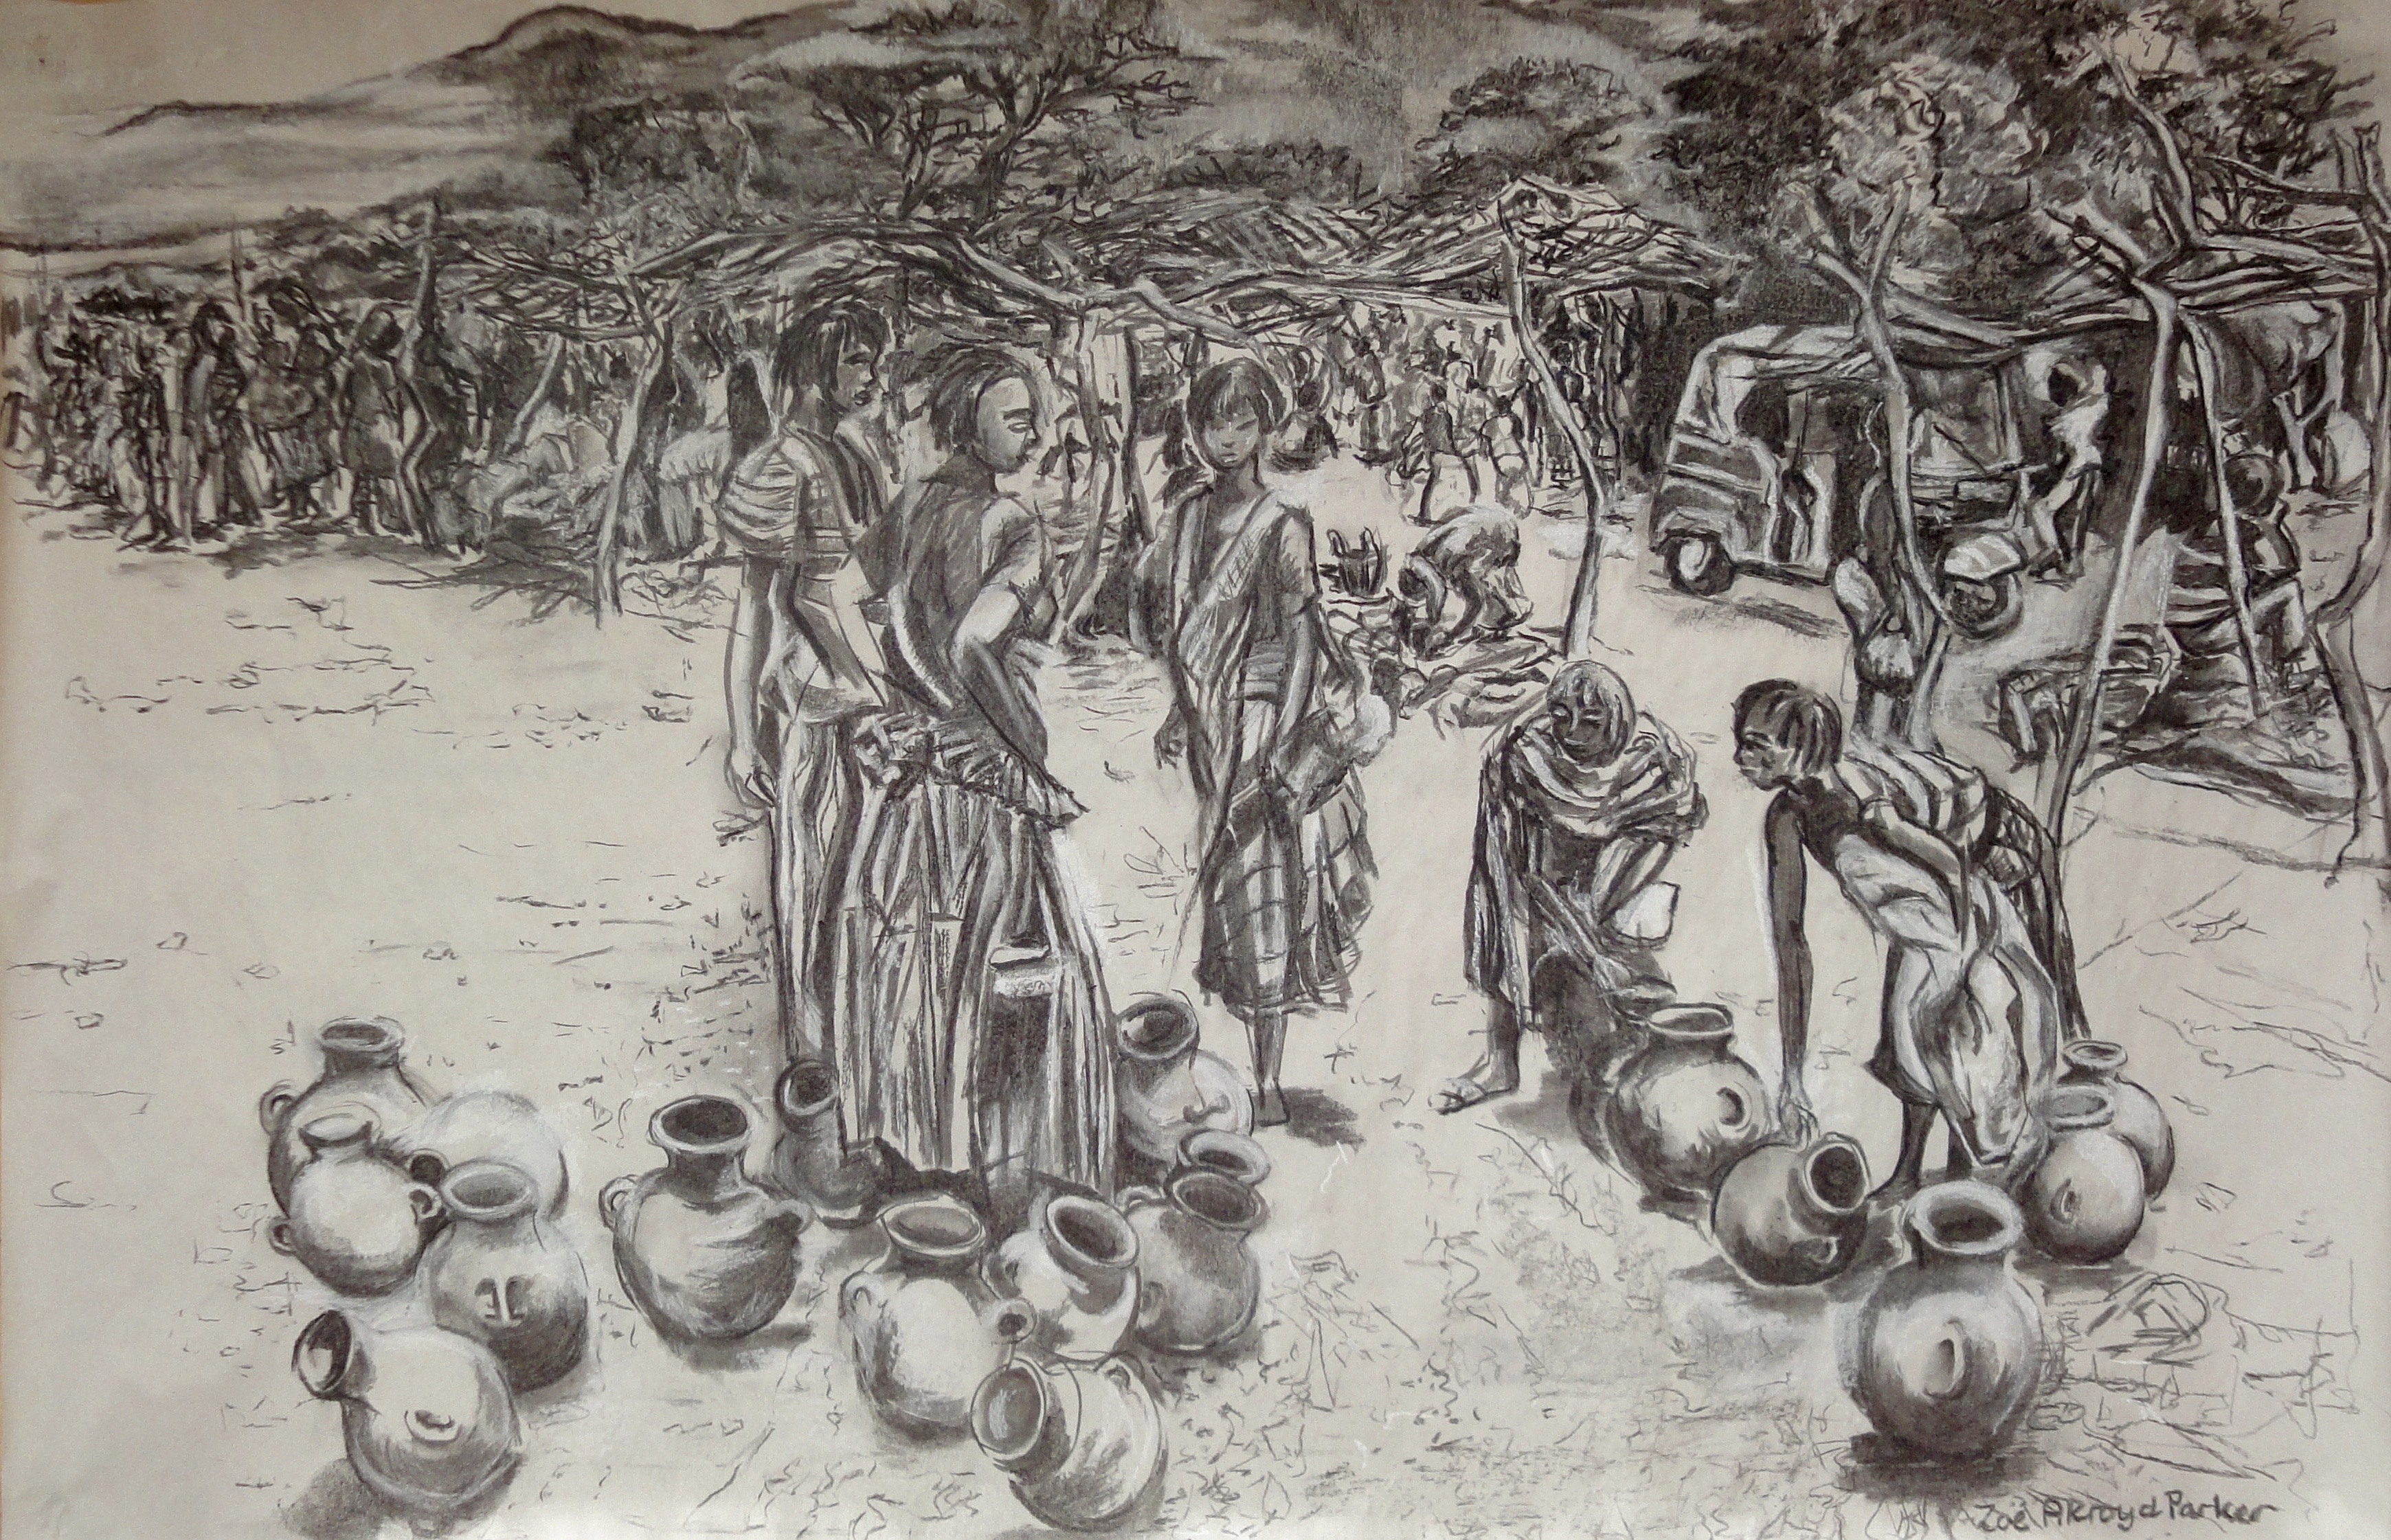 Dimeka Market (Bartering Over Pots)